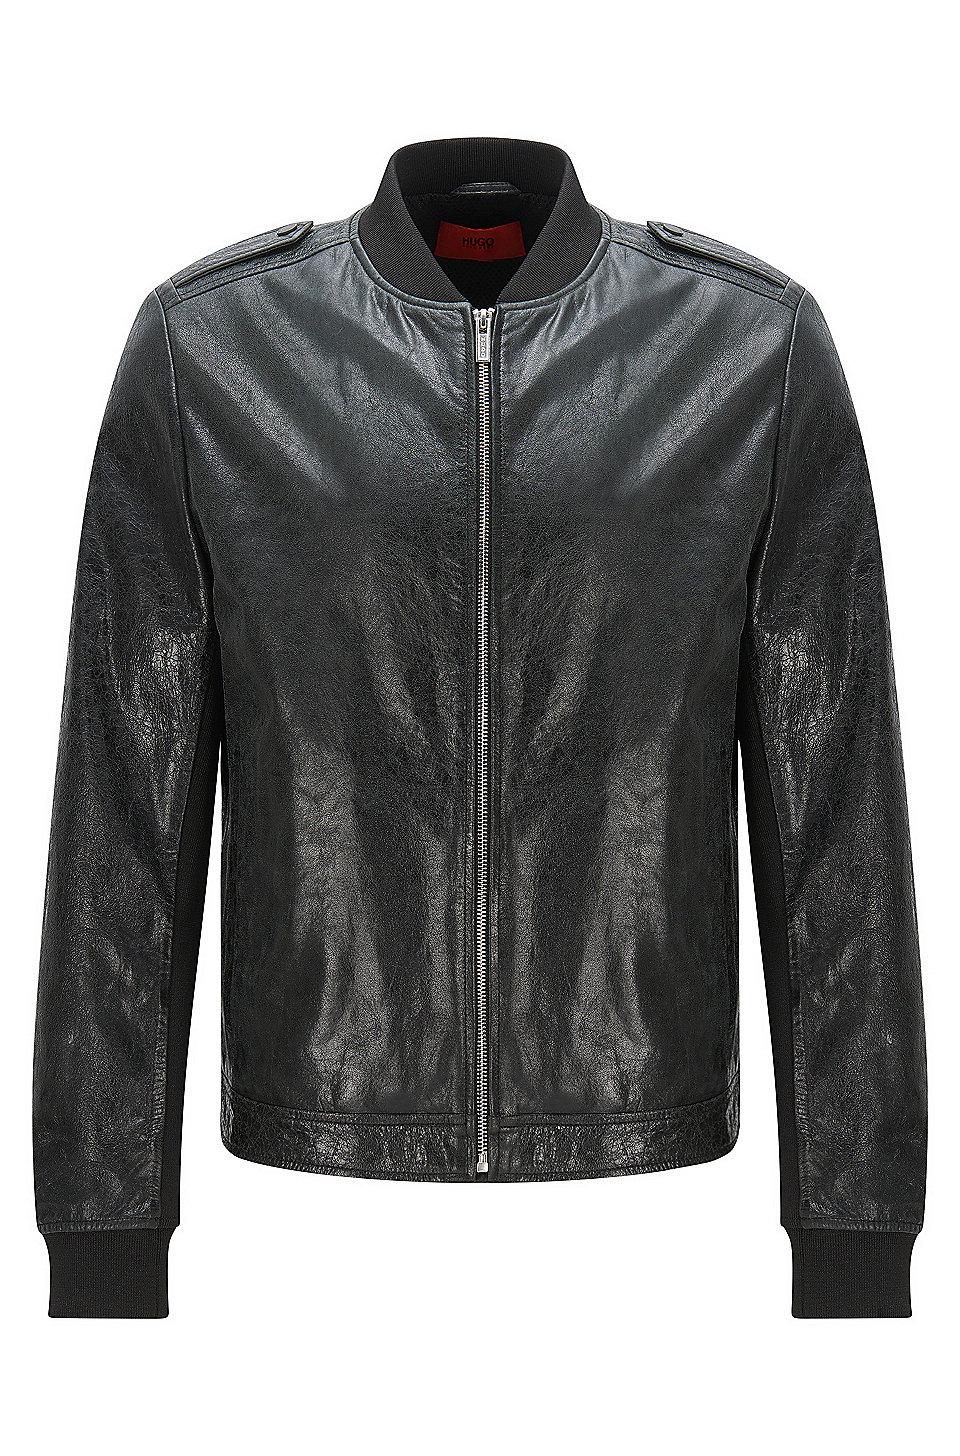 Hugo boss ladies leather gloves -  Lessko Lambskin Leather Jacket